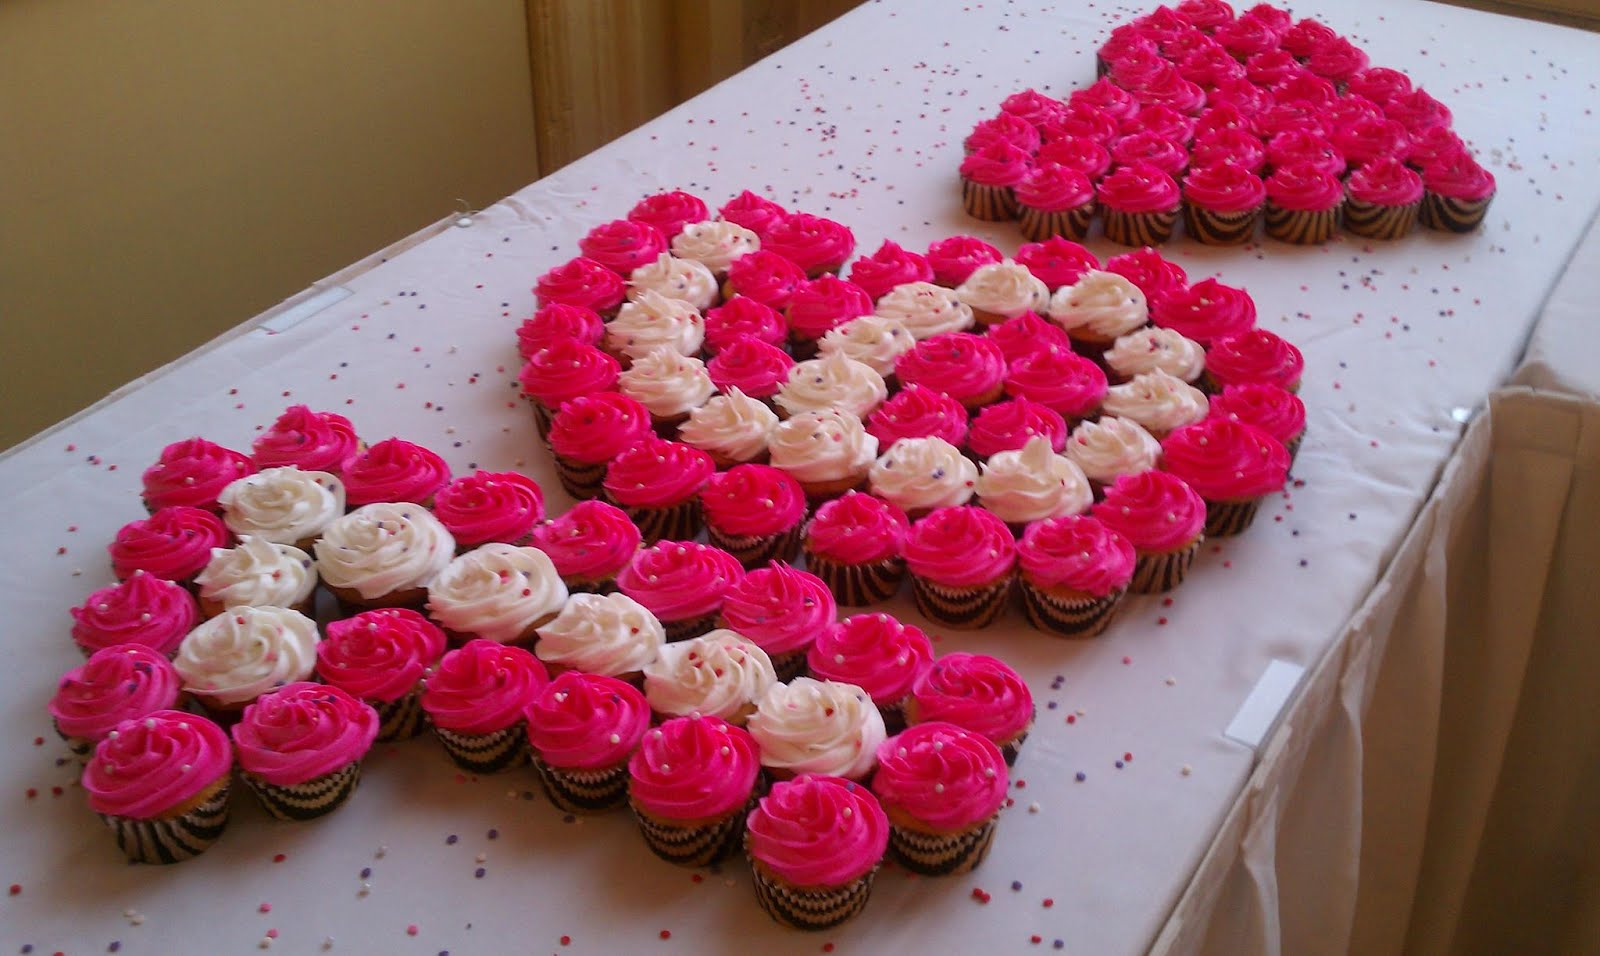 Introducing Sweet 16 Cupcakes